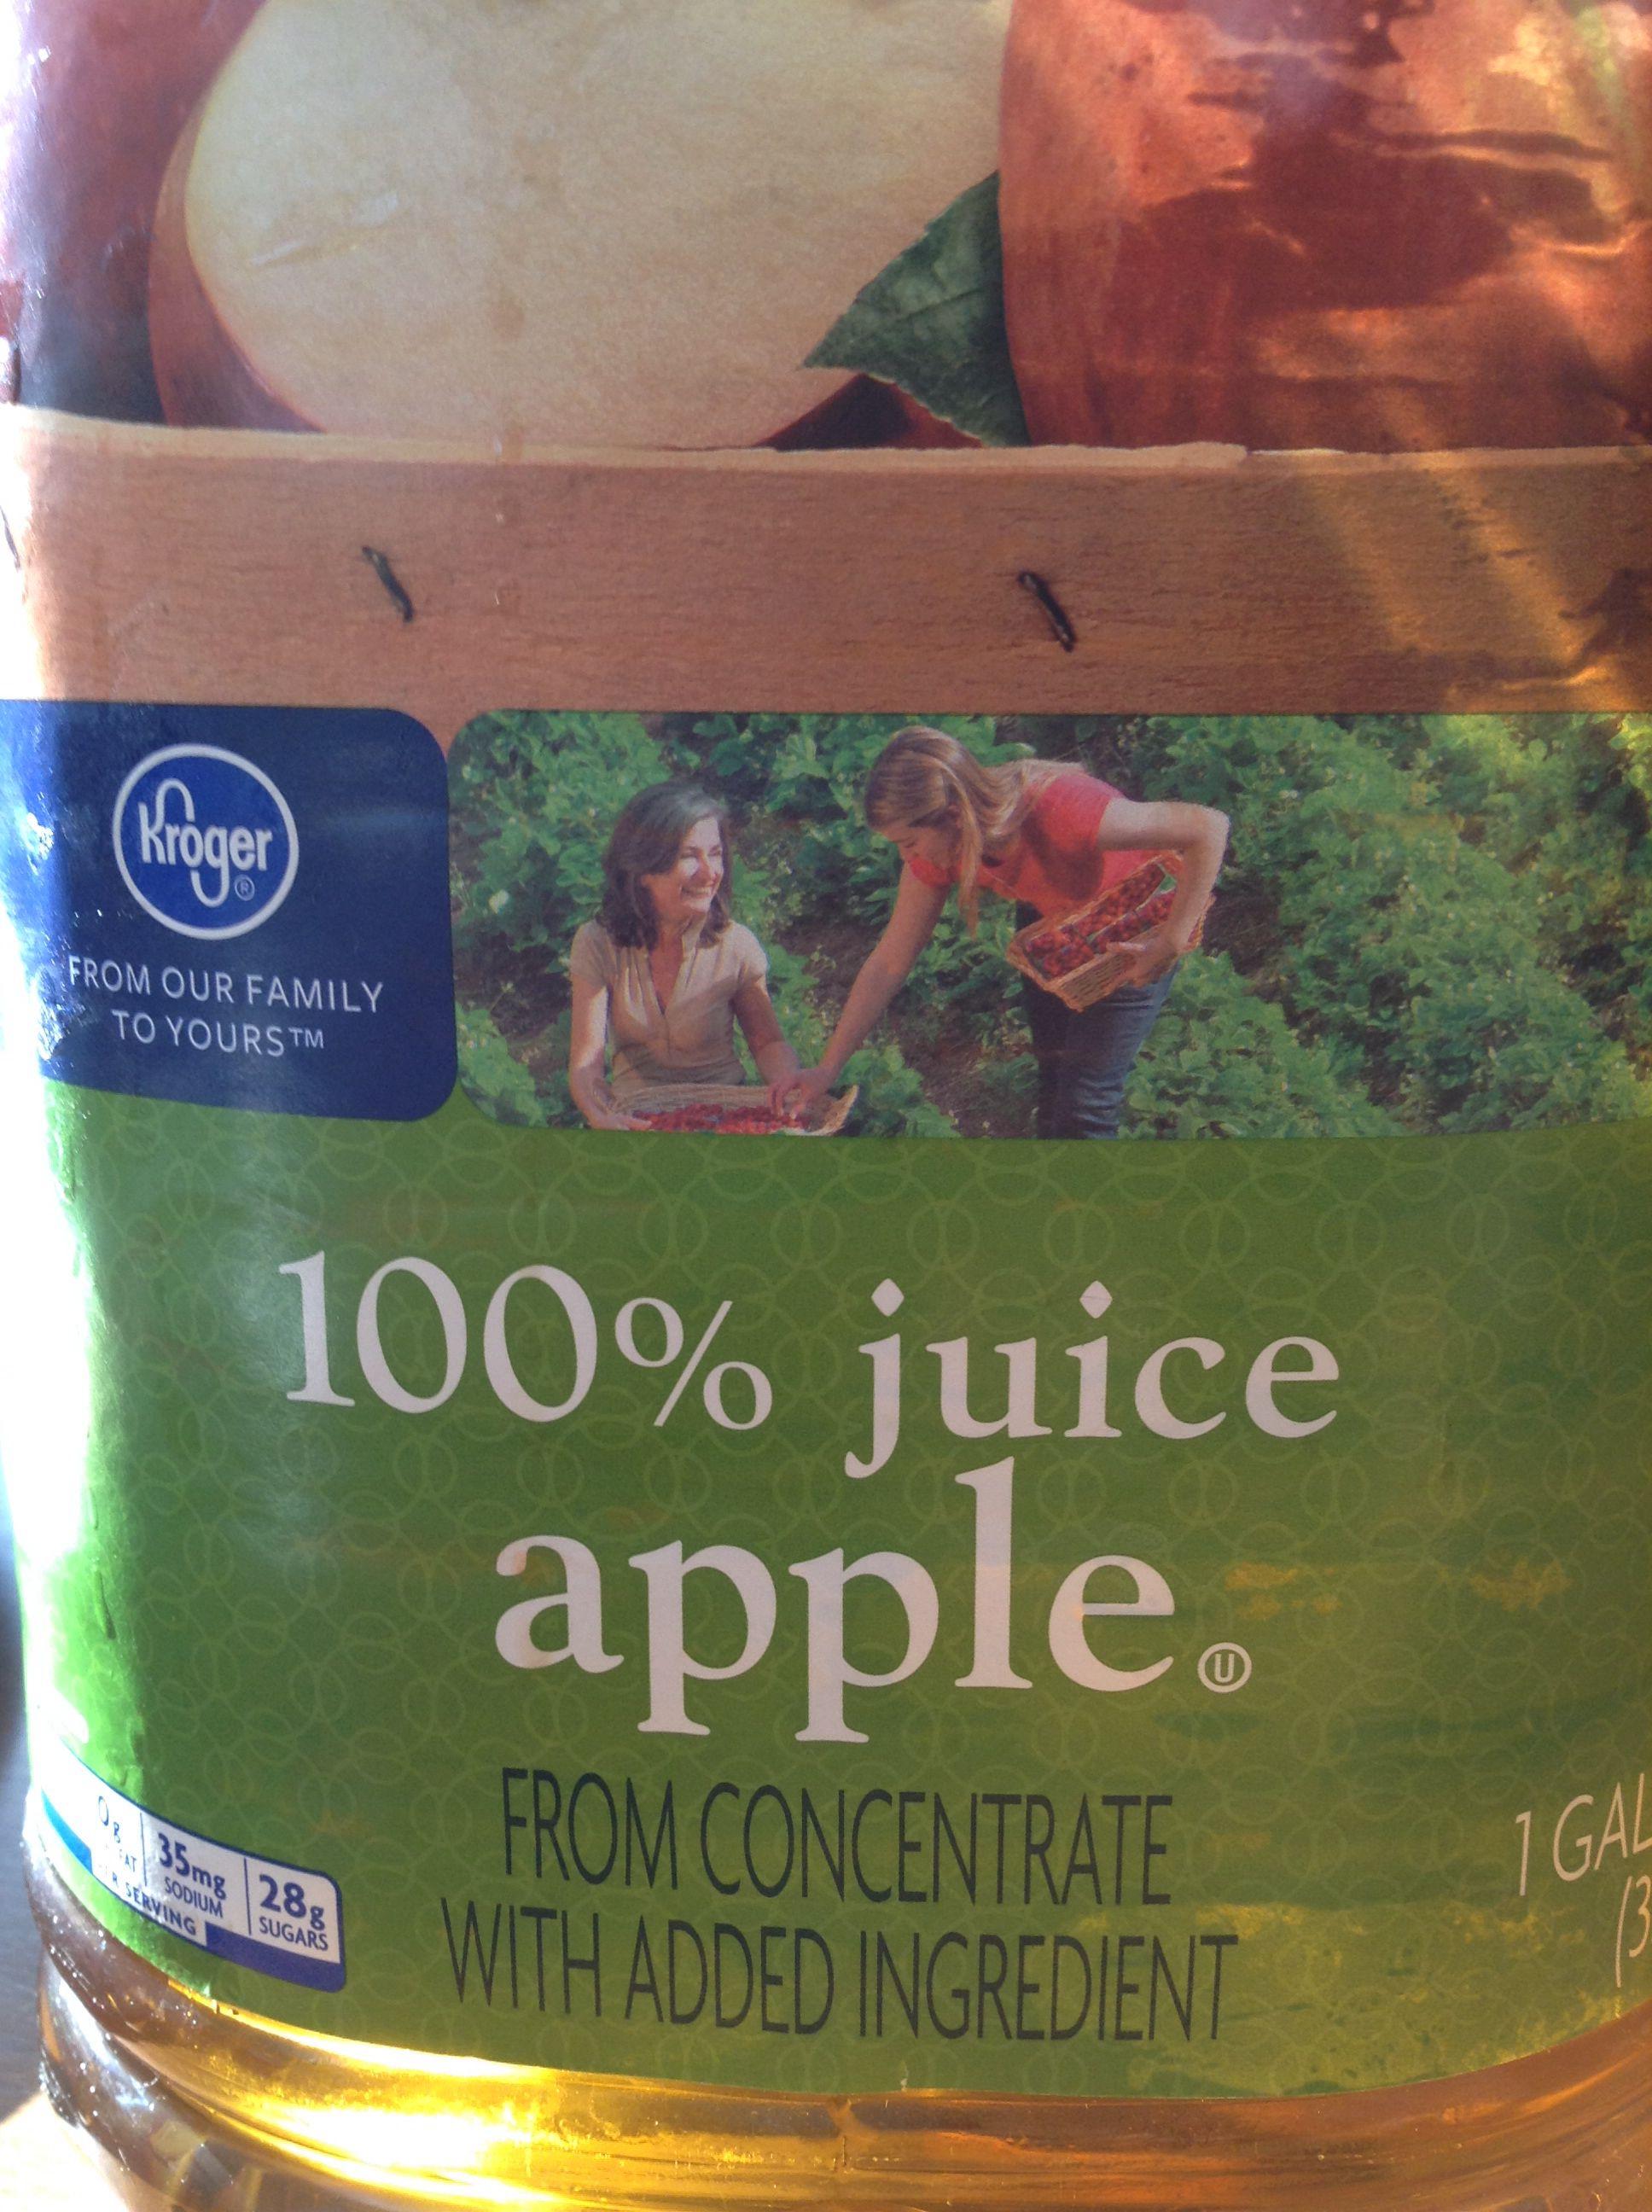 Oh good! It's 100% juice apple...lol